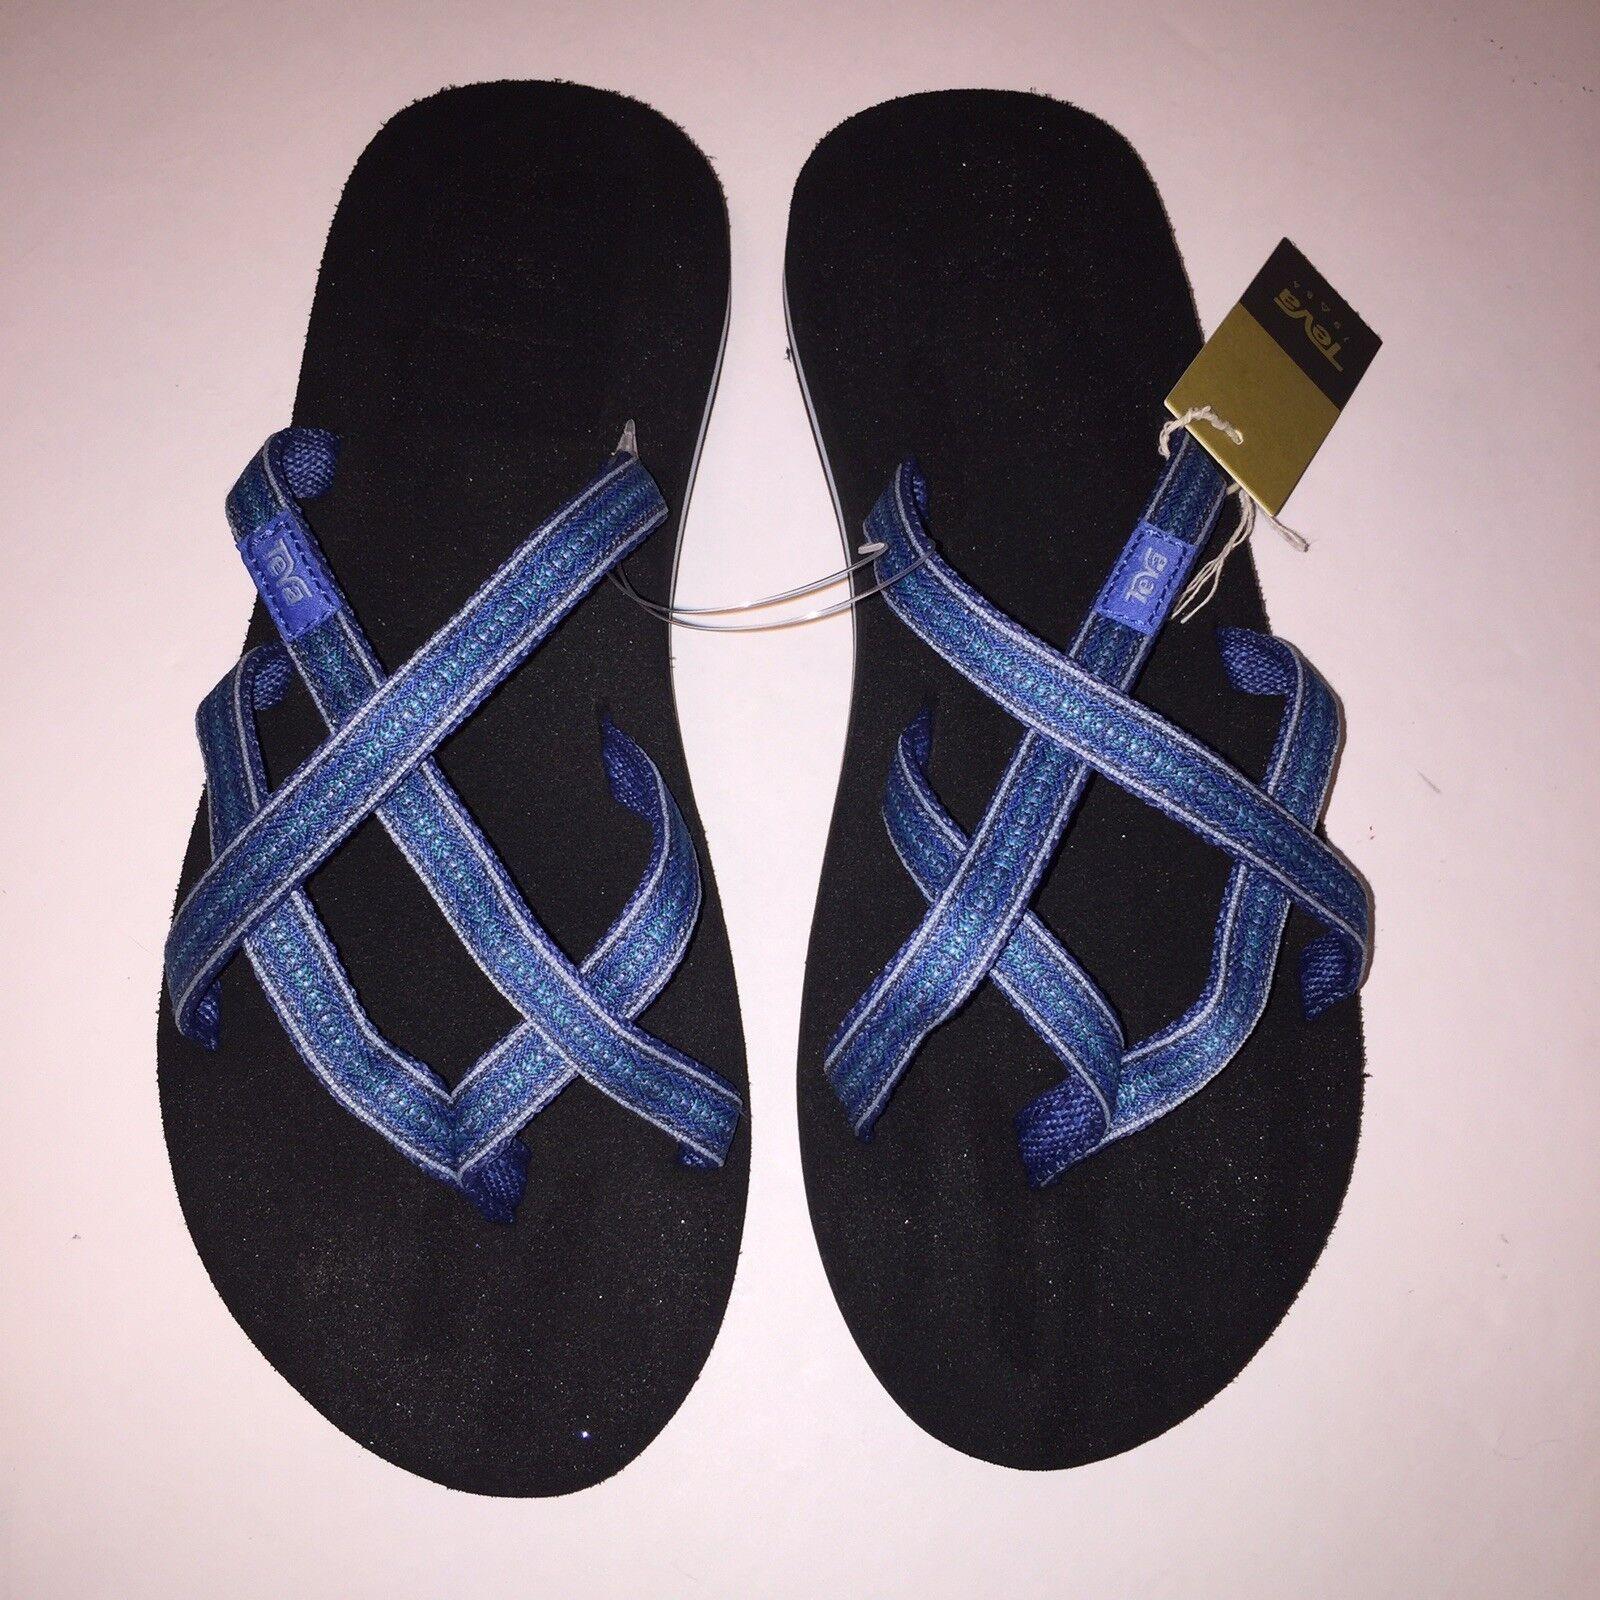 24afe6027656 Teva Olowahu Womens Flip Flops Shoes Pintado Blue 9 M for sale ...